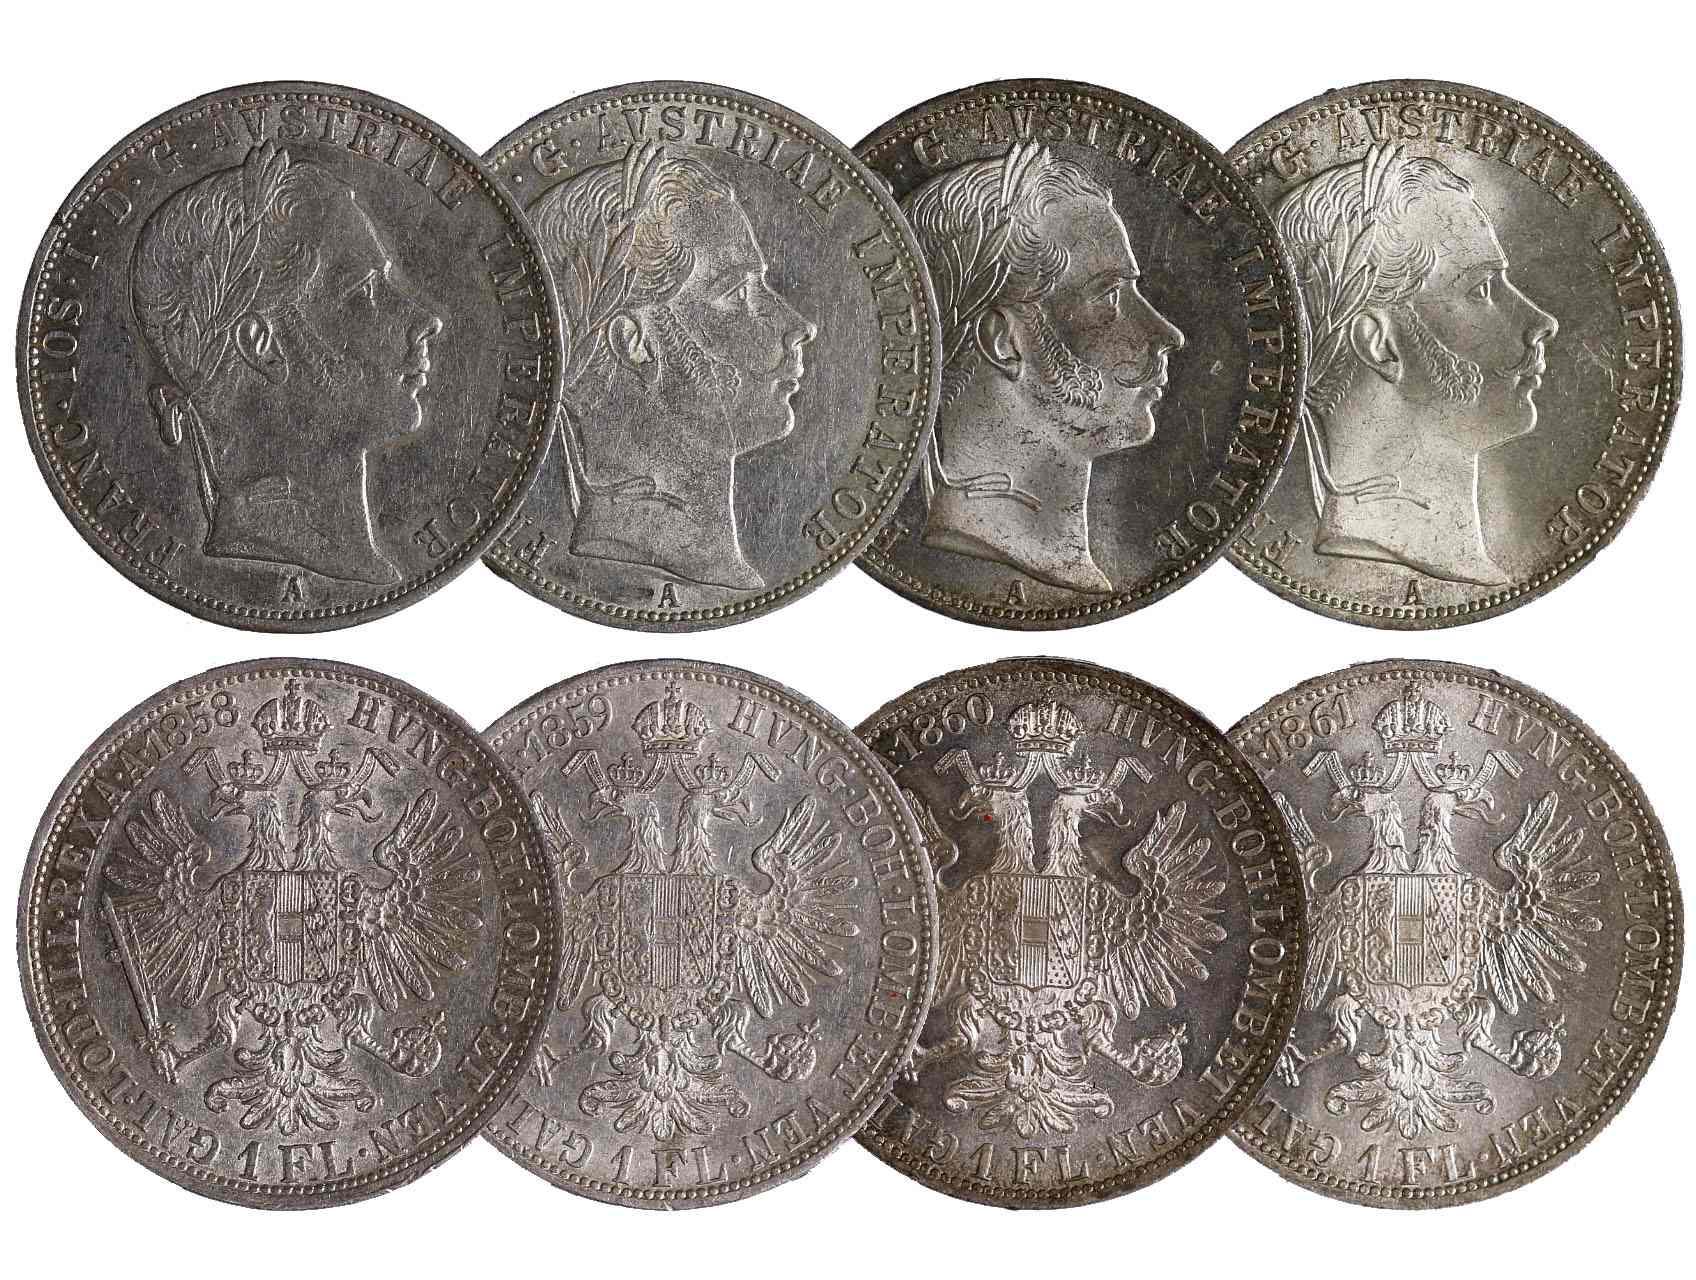 František Josef I. 1848-1916 - 1 Zlatník 1858 A, 1859 A, 1860 A a 1861 A, celkem 4 ks., N39